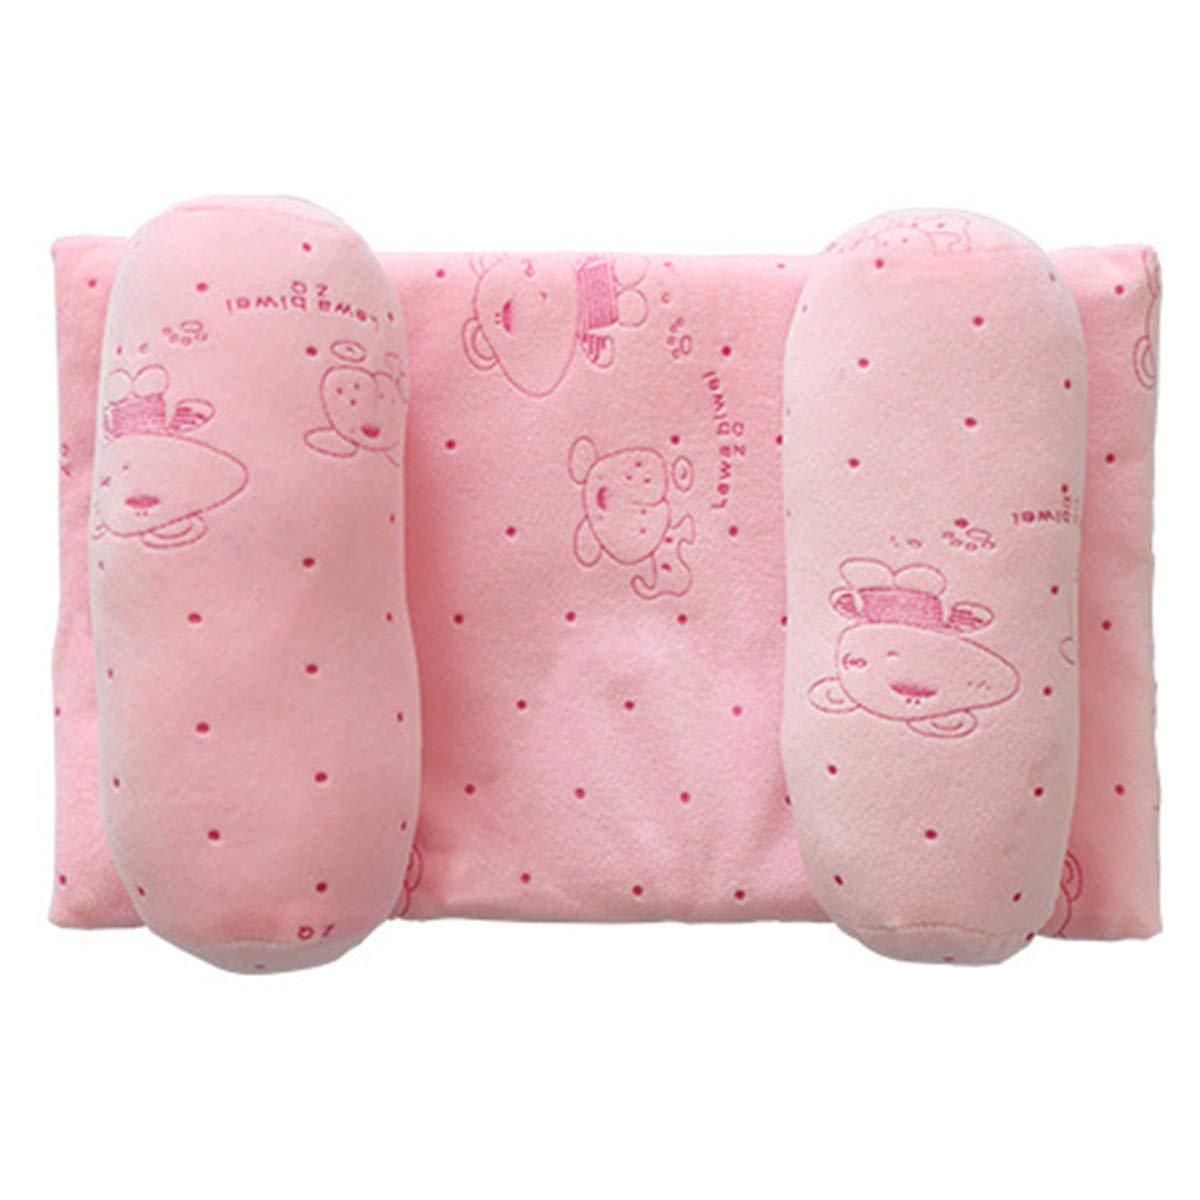 WFHhsxfh Newborn Styling Pillow Baby Sleeping Pillow baby product Color : Blue Baby Pillow